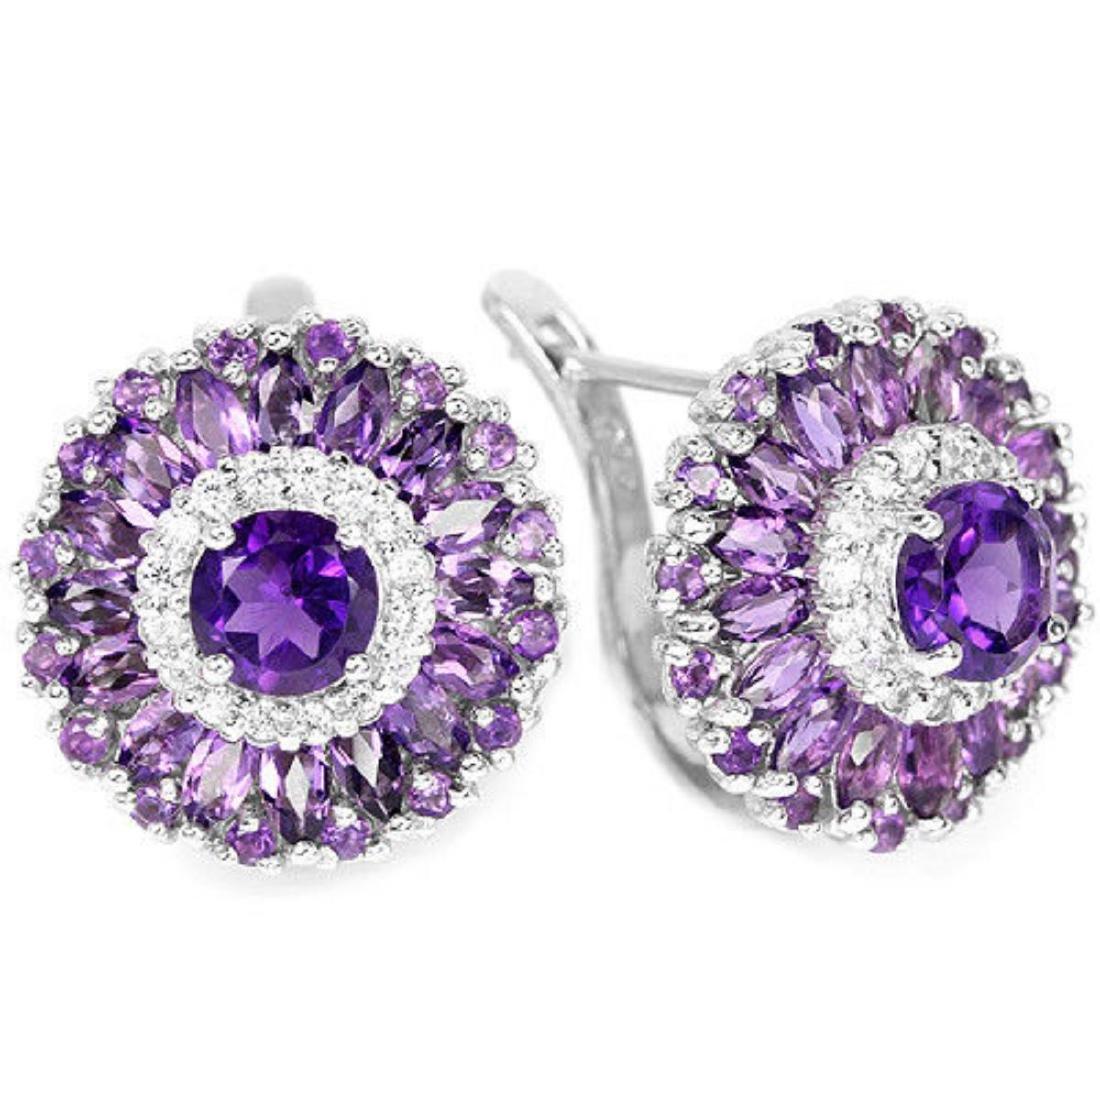 NATURAL AAA PURPLE AMETHYST Earrings